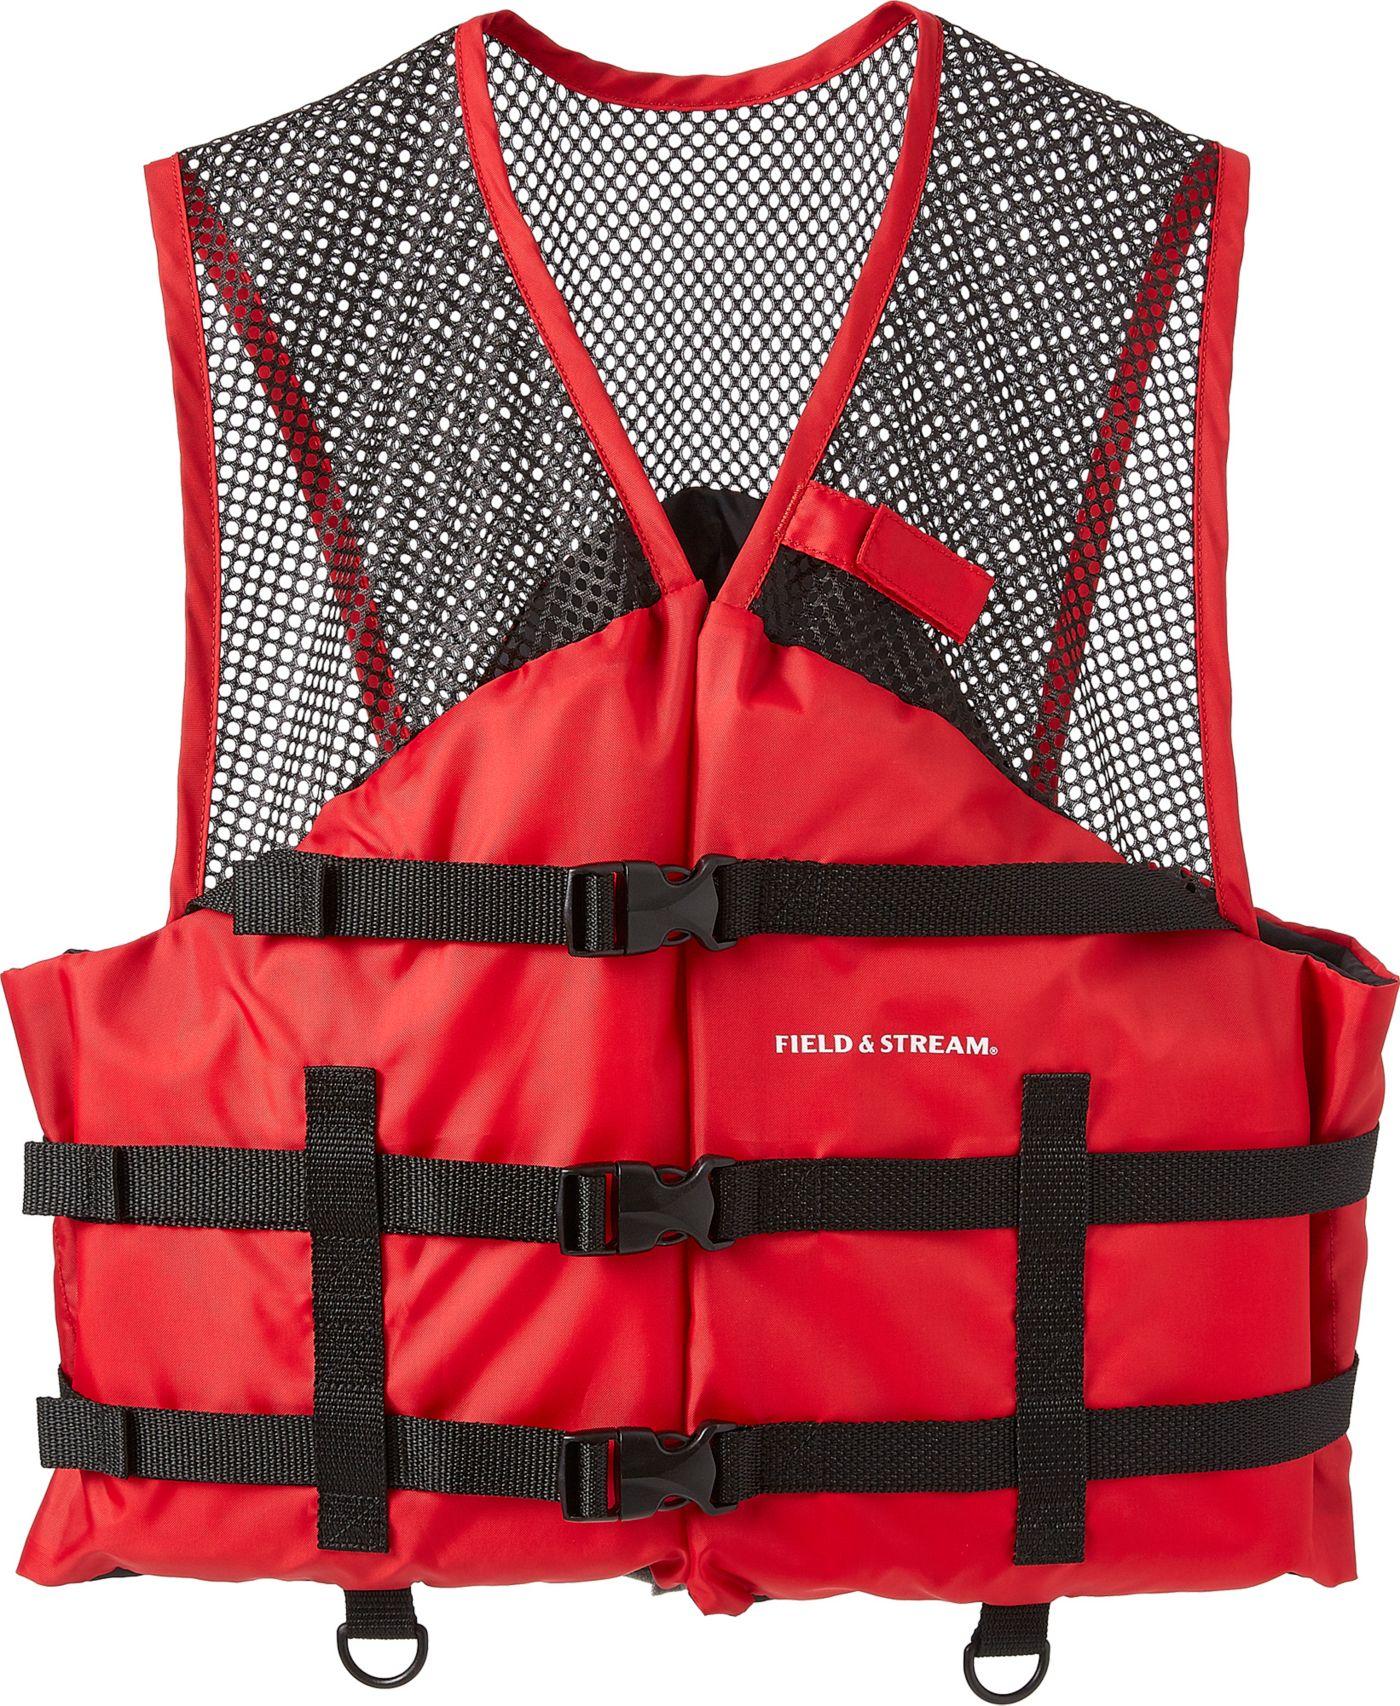 Field & Stream Adult Basic Mesh Life Vest